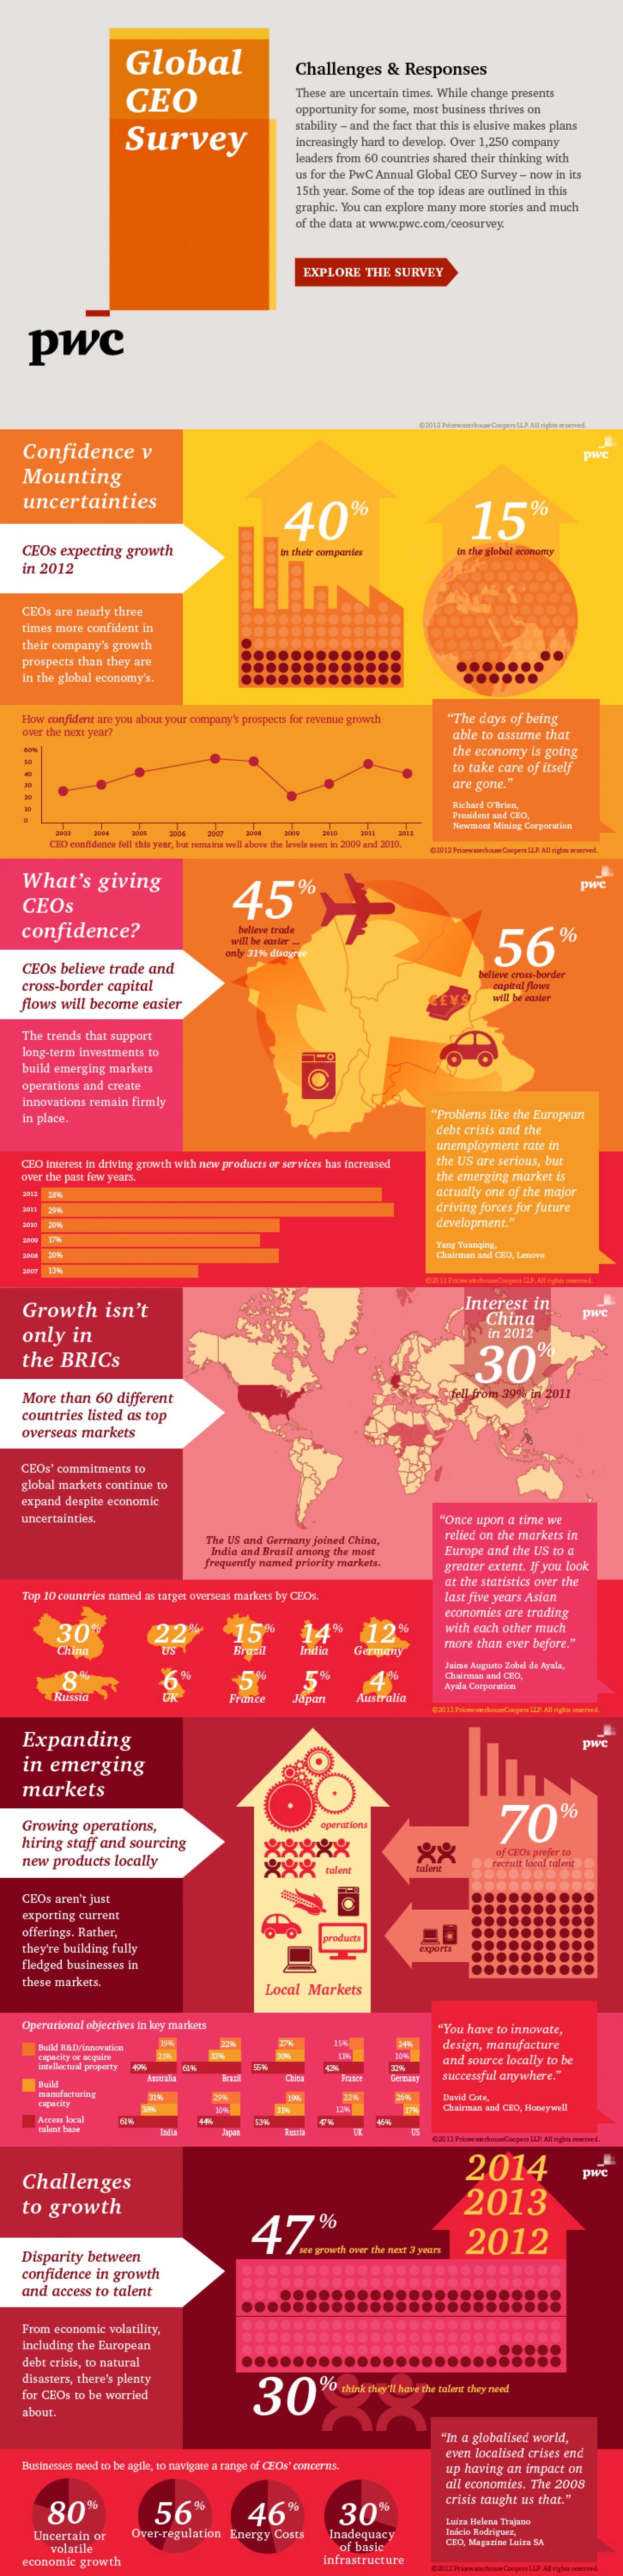 9. PwC Annual Global CEO Survey